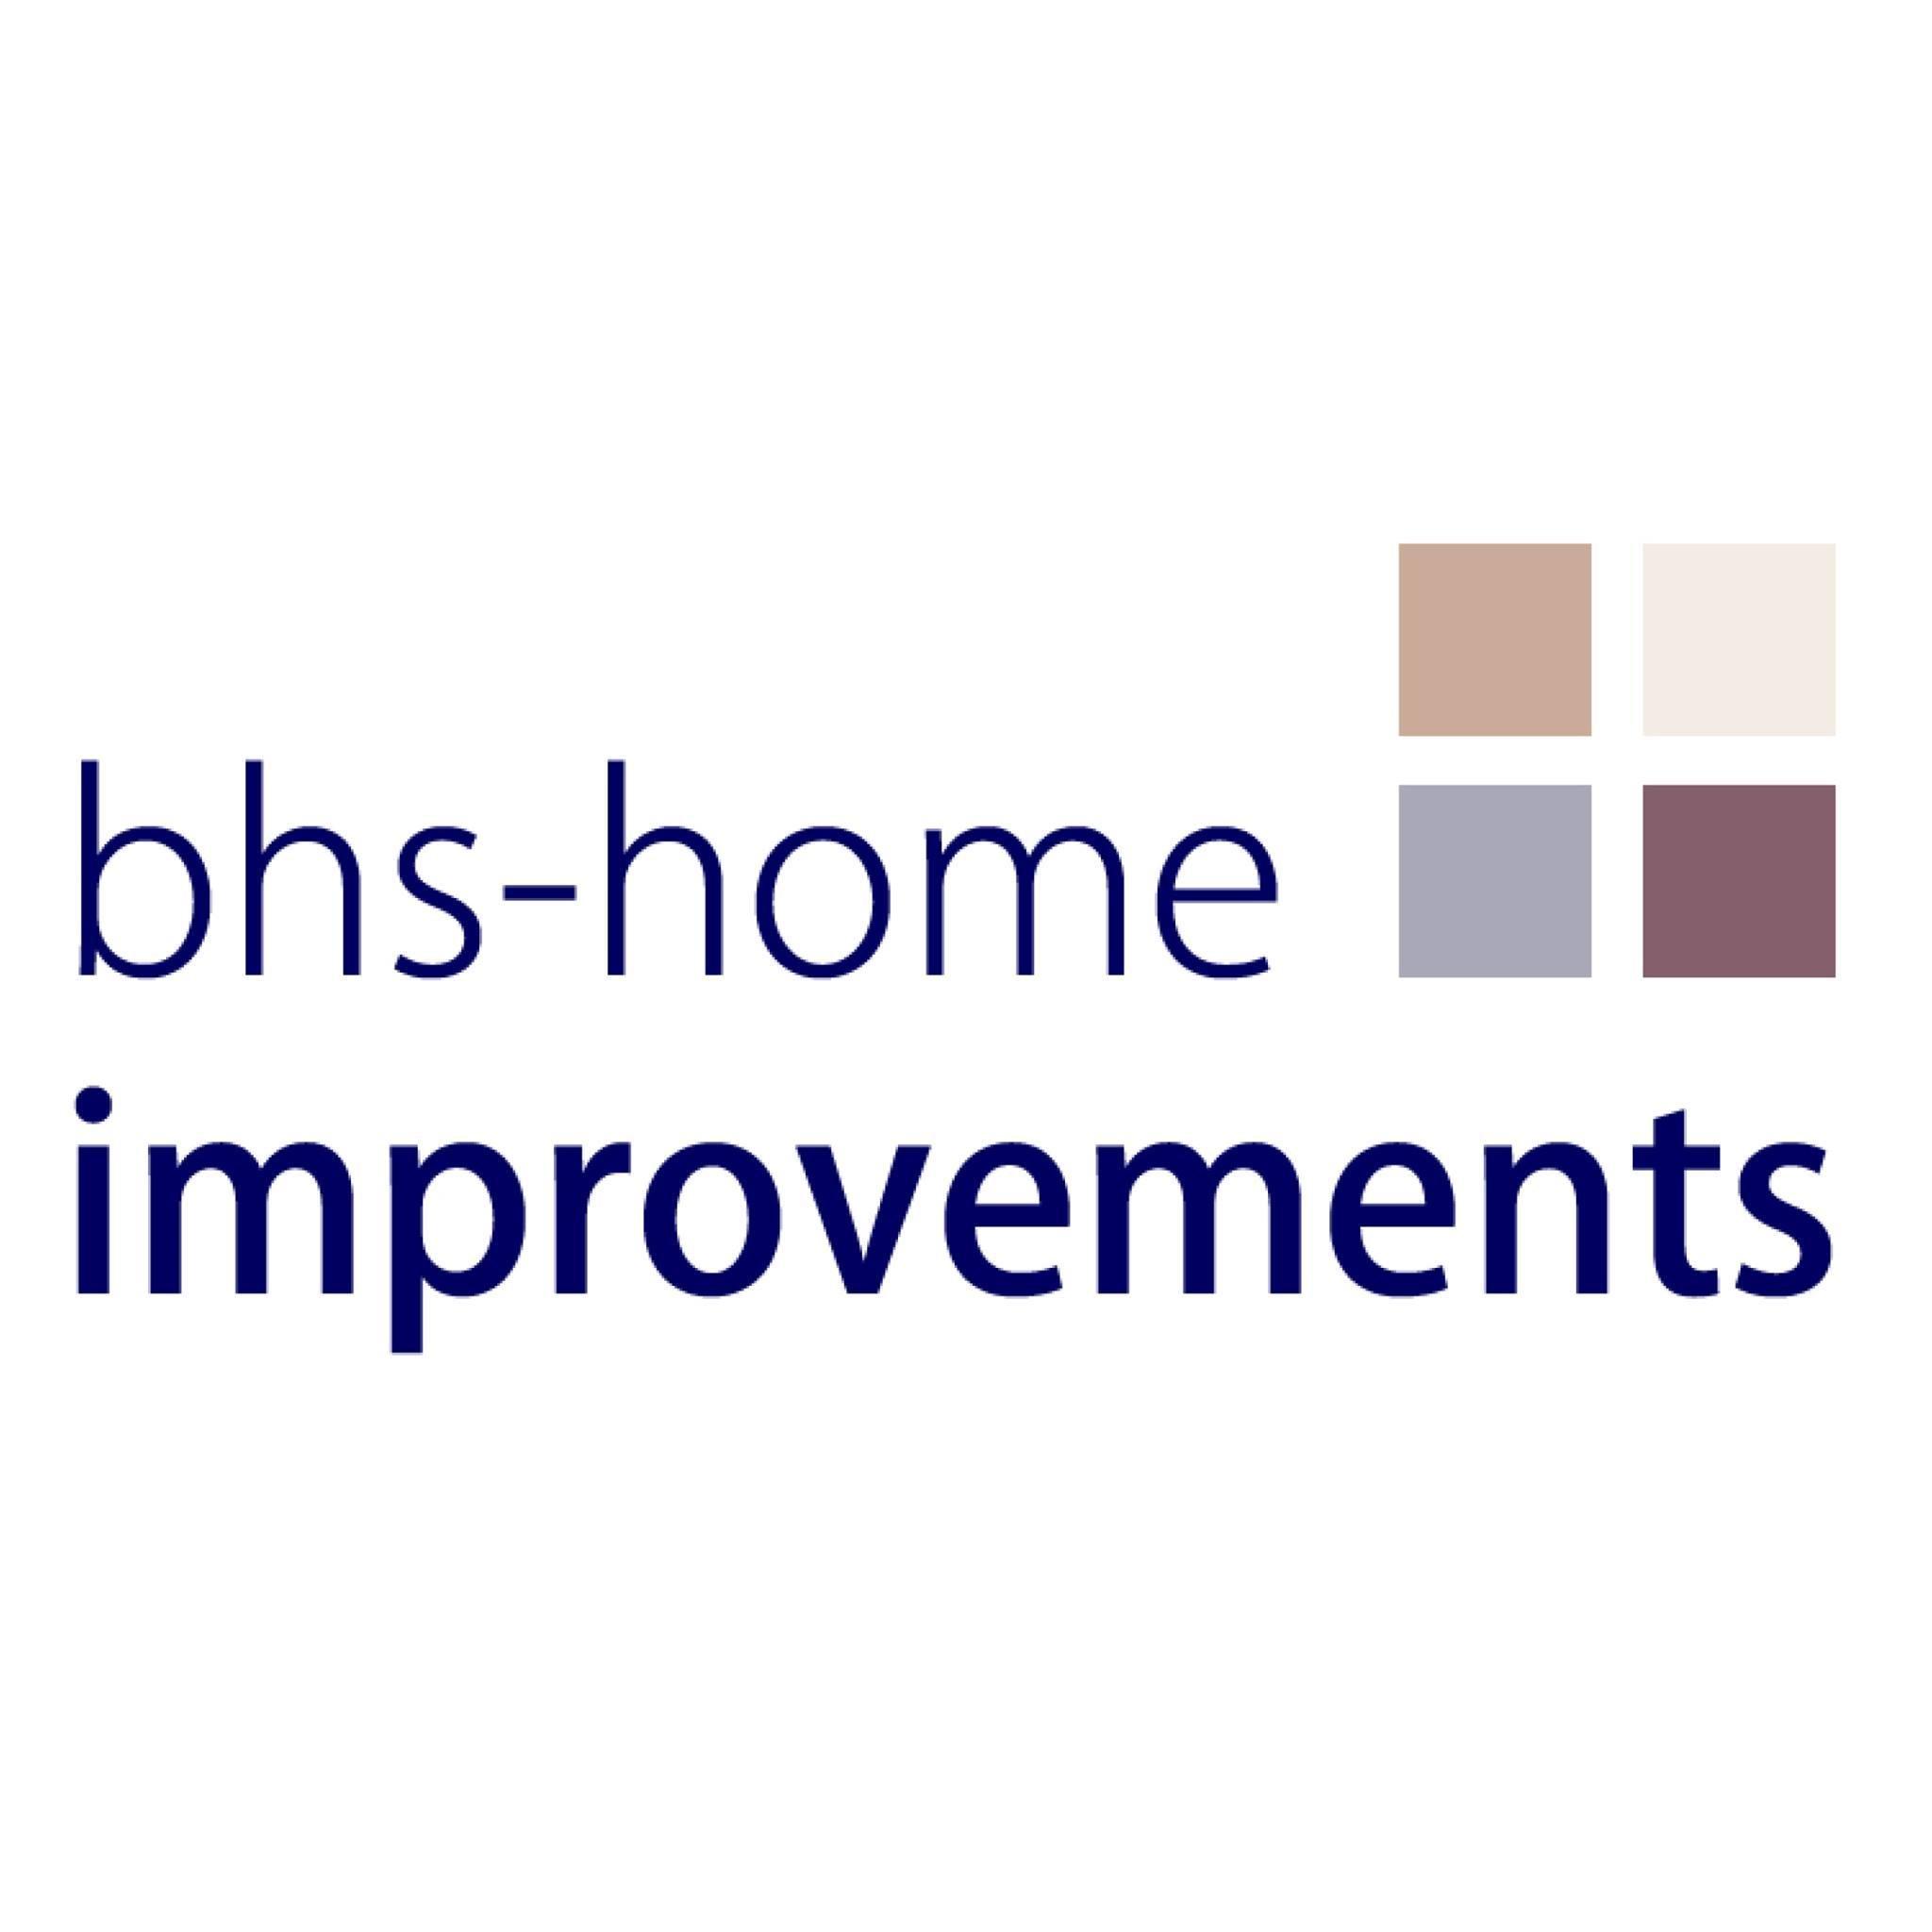 Bhs-Home improvement (@Bhsimprovements) | Twitter